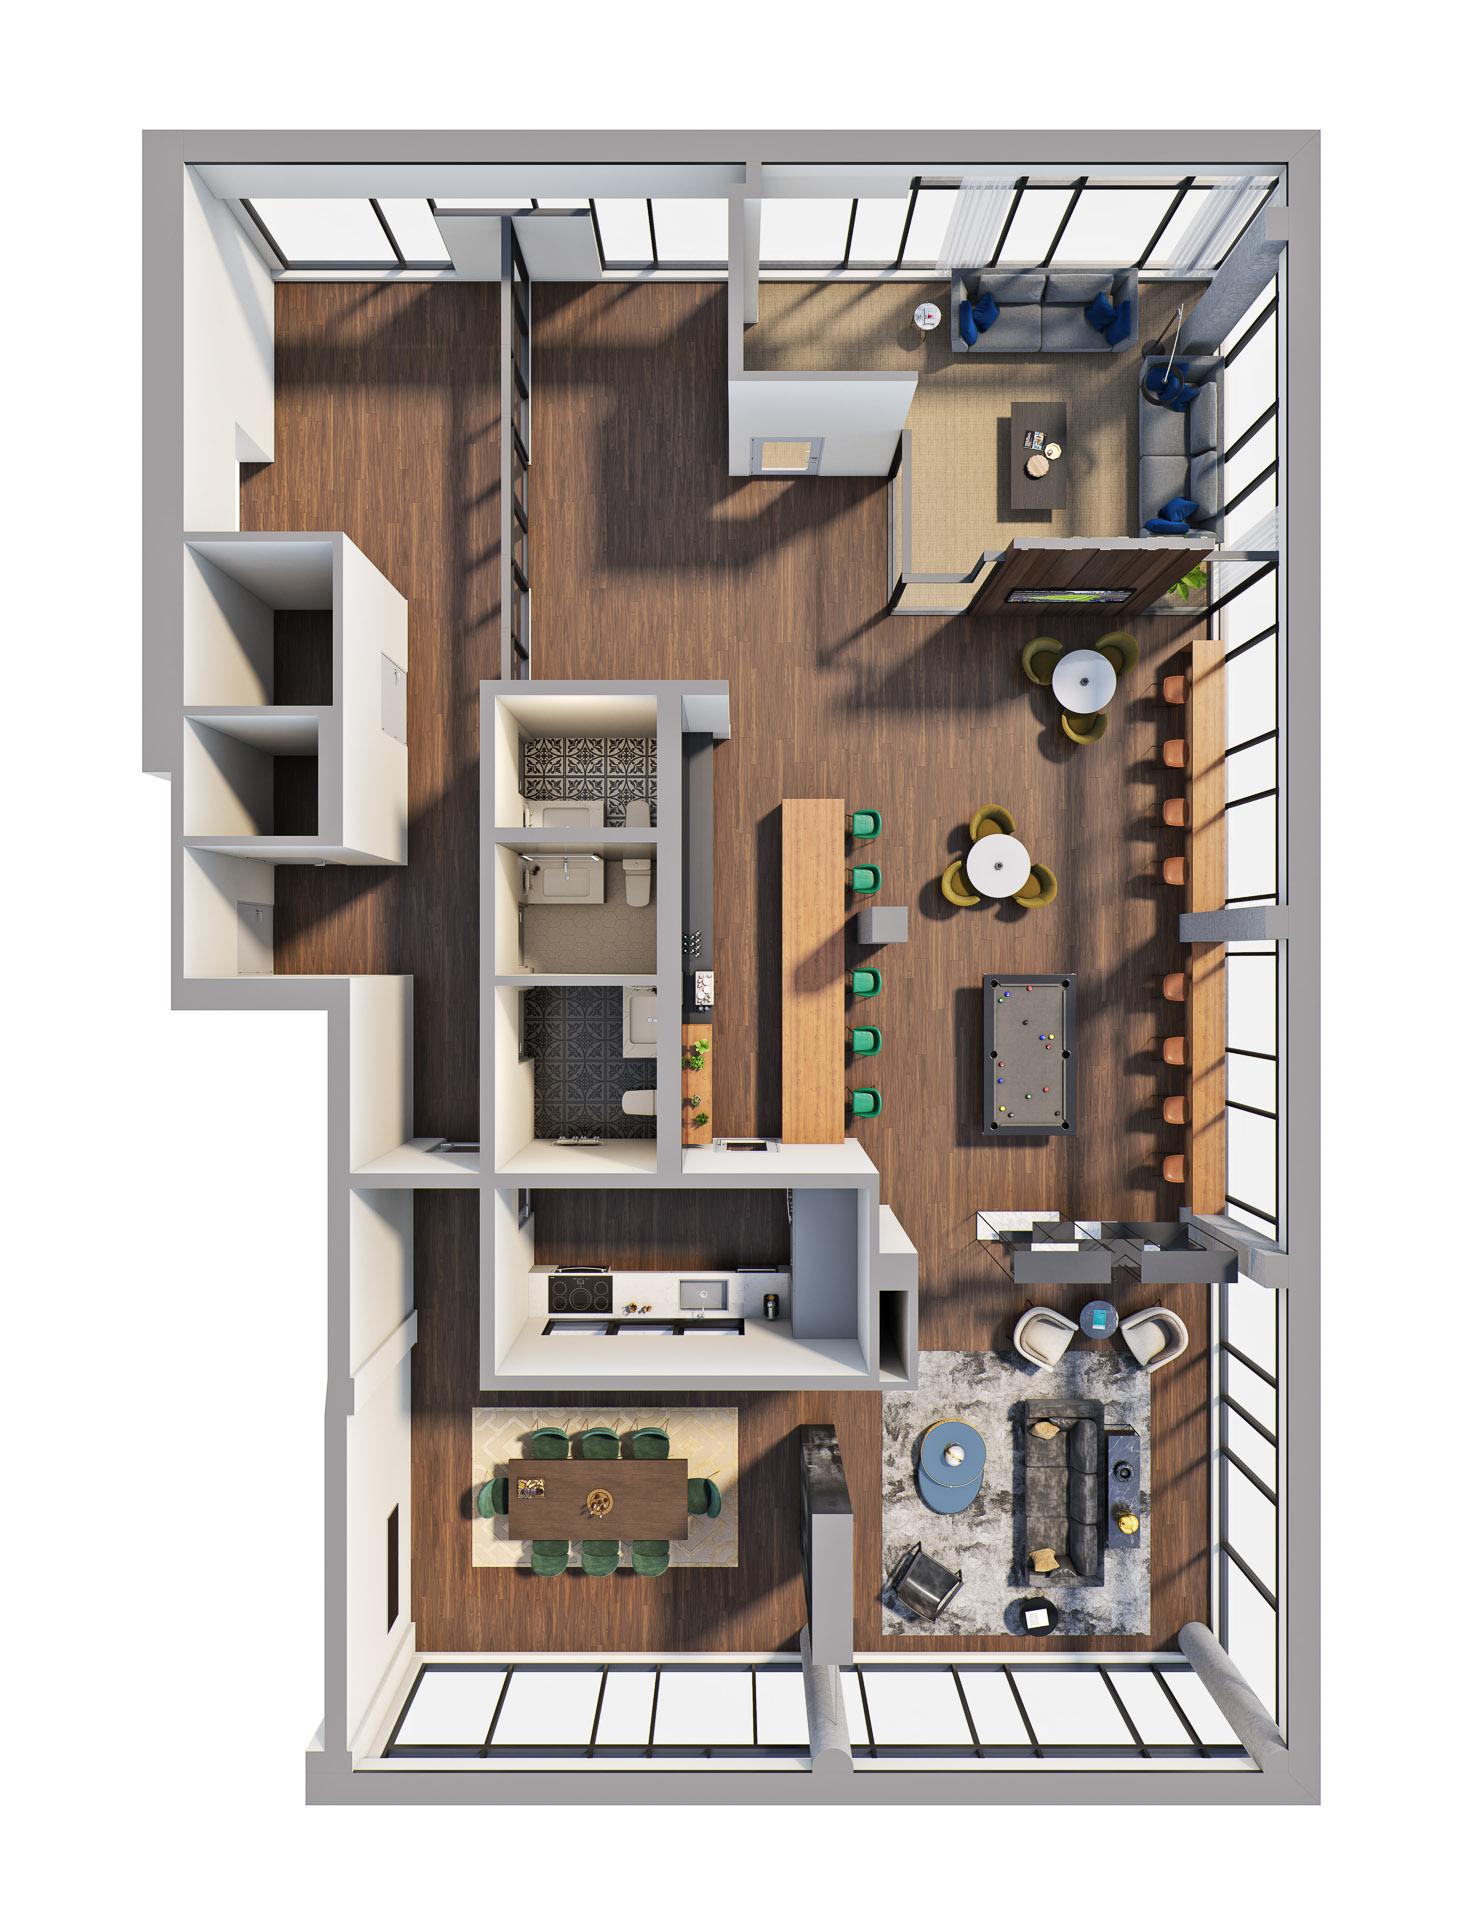 KODACondos_Interior_Level17_TopView_032019